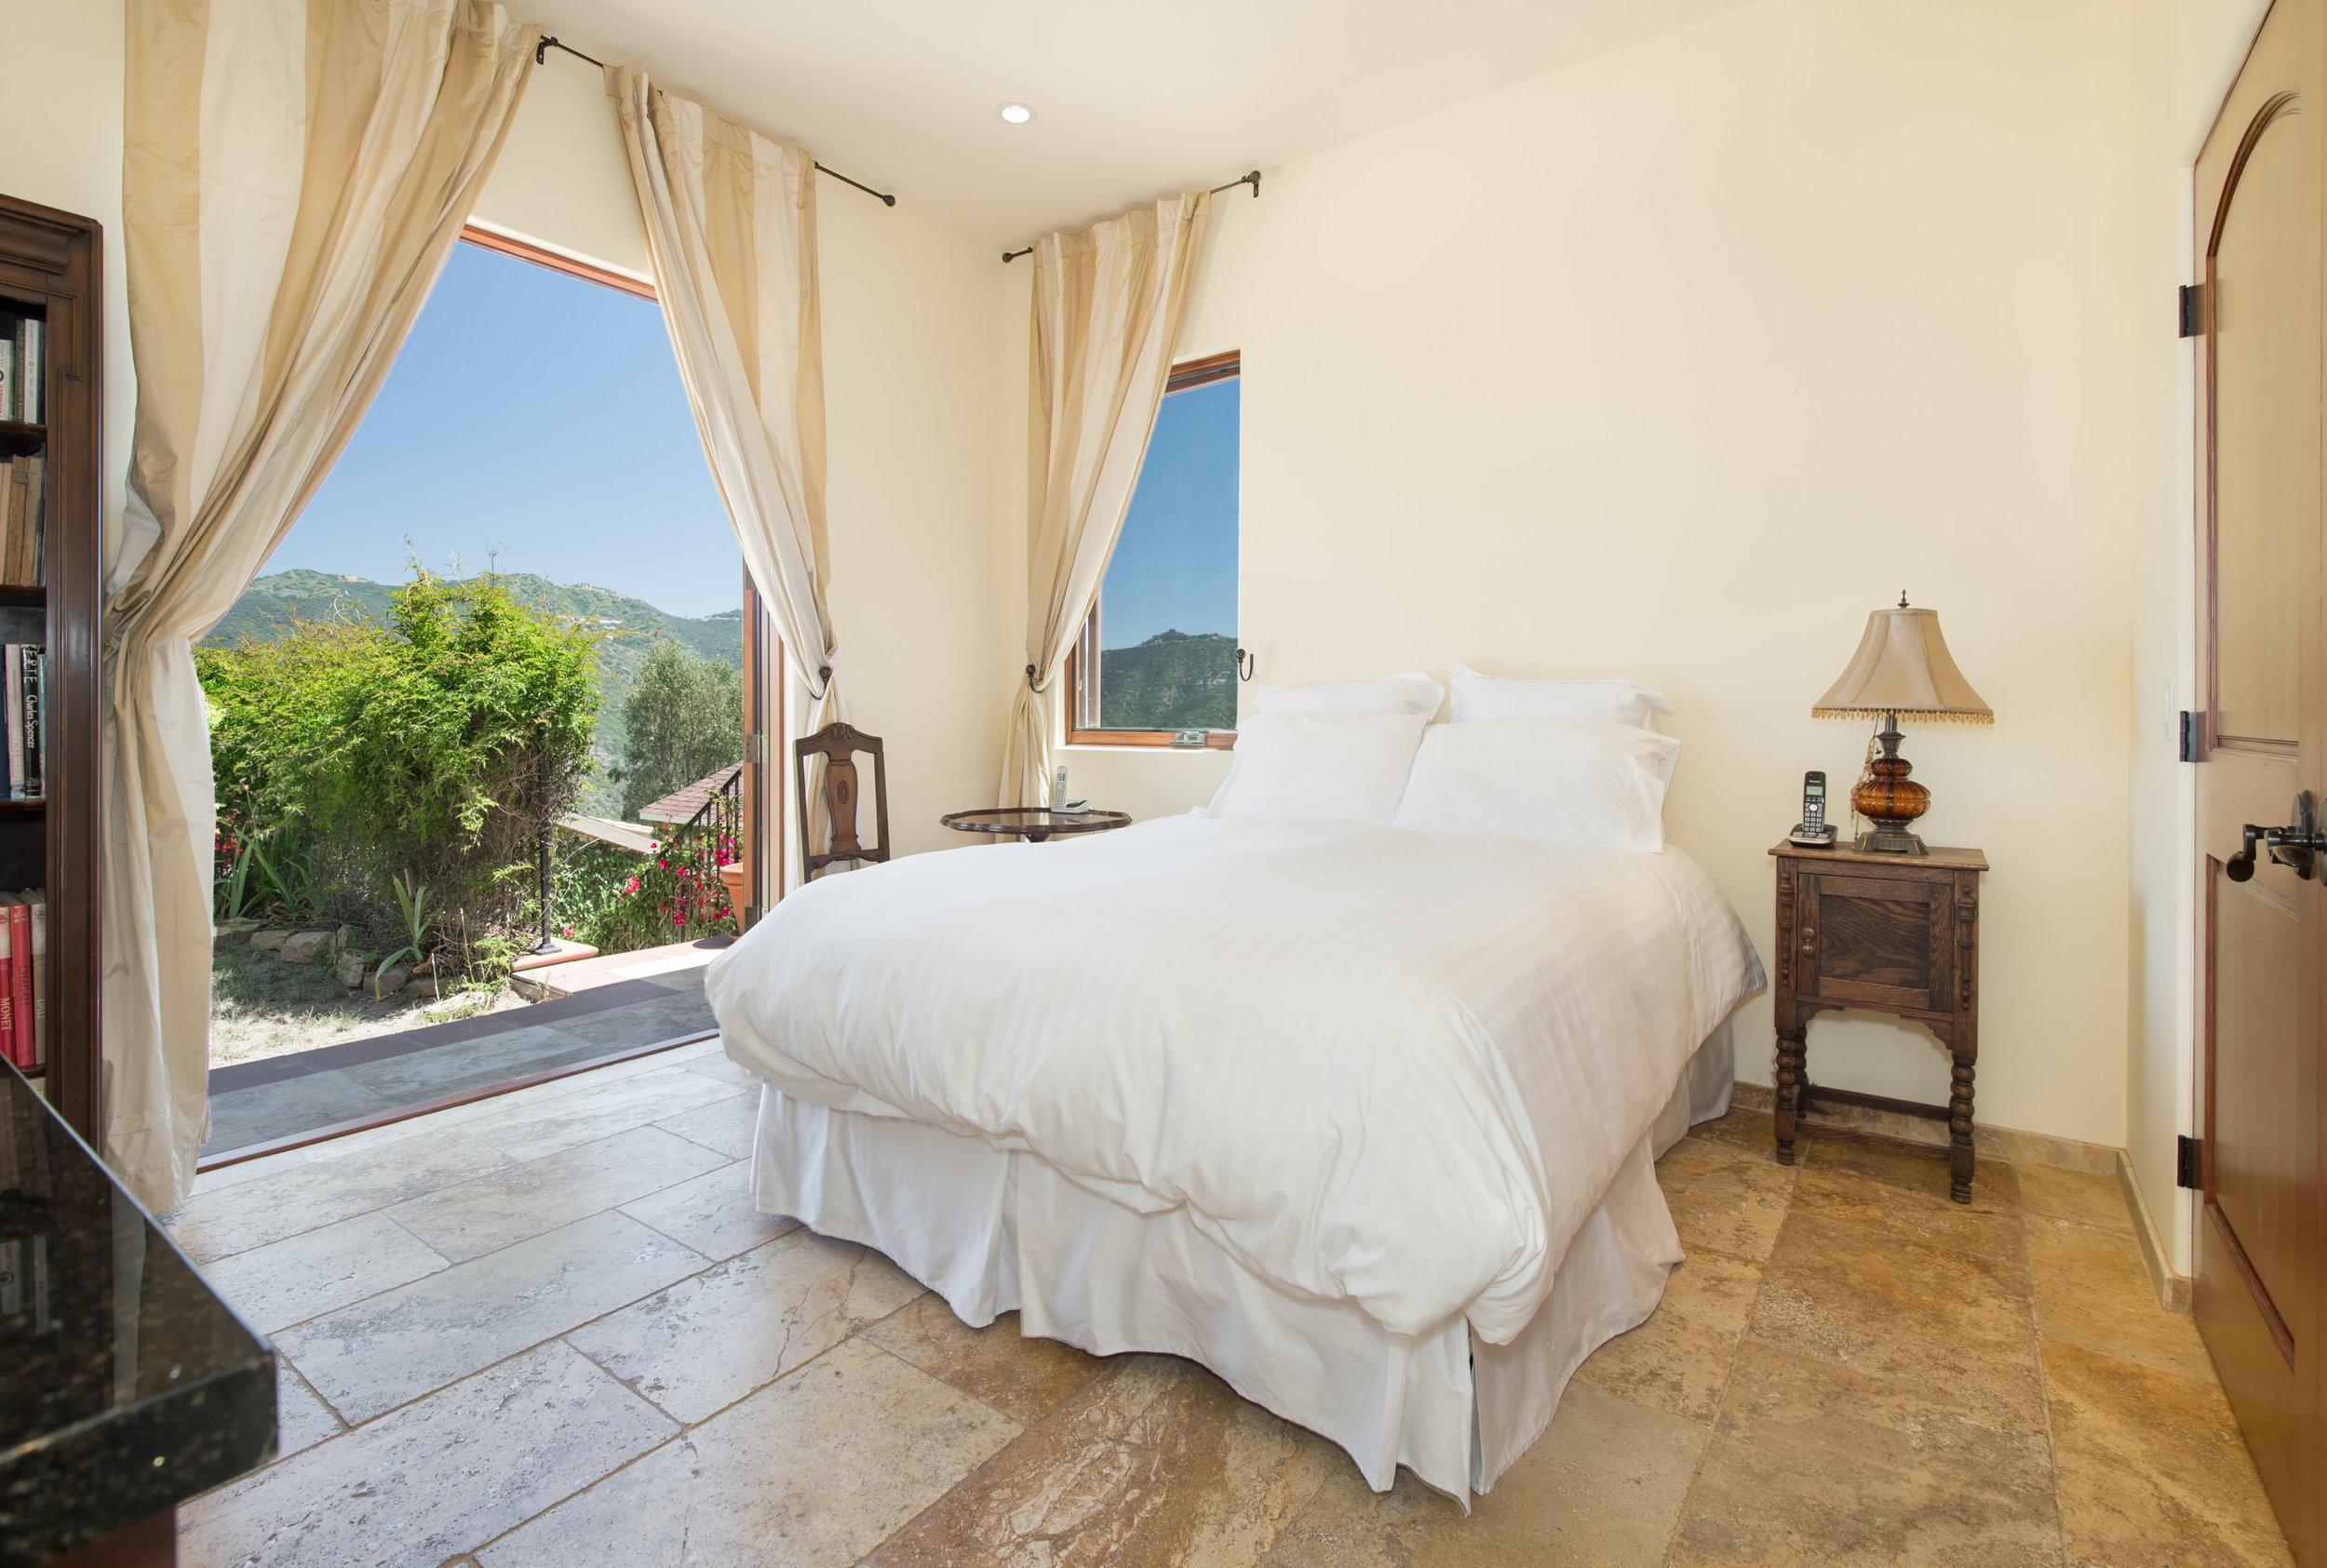 021Guest Bedroom 26303 Lockwood Road Malibu For Sale Lease The Malibu Life Team Luxury Real Estate.jpg